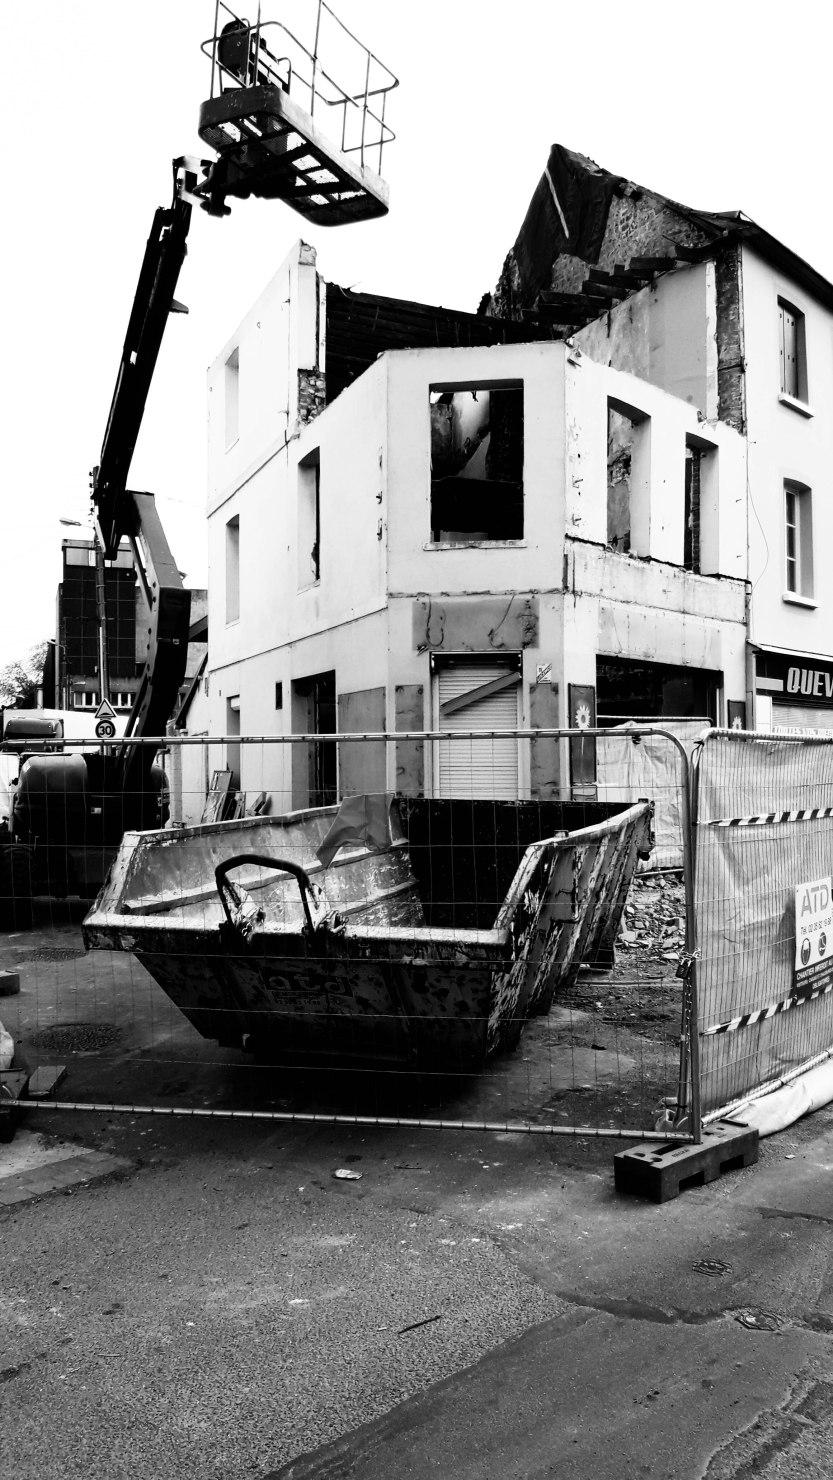 Rue Jean Jaurès Petit Quevilly.jpg